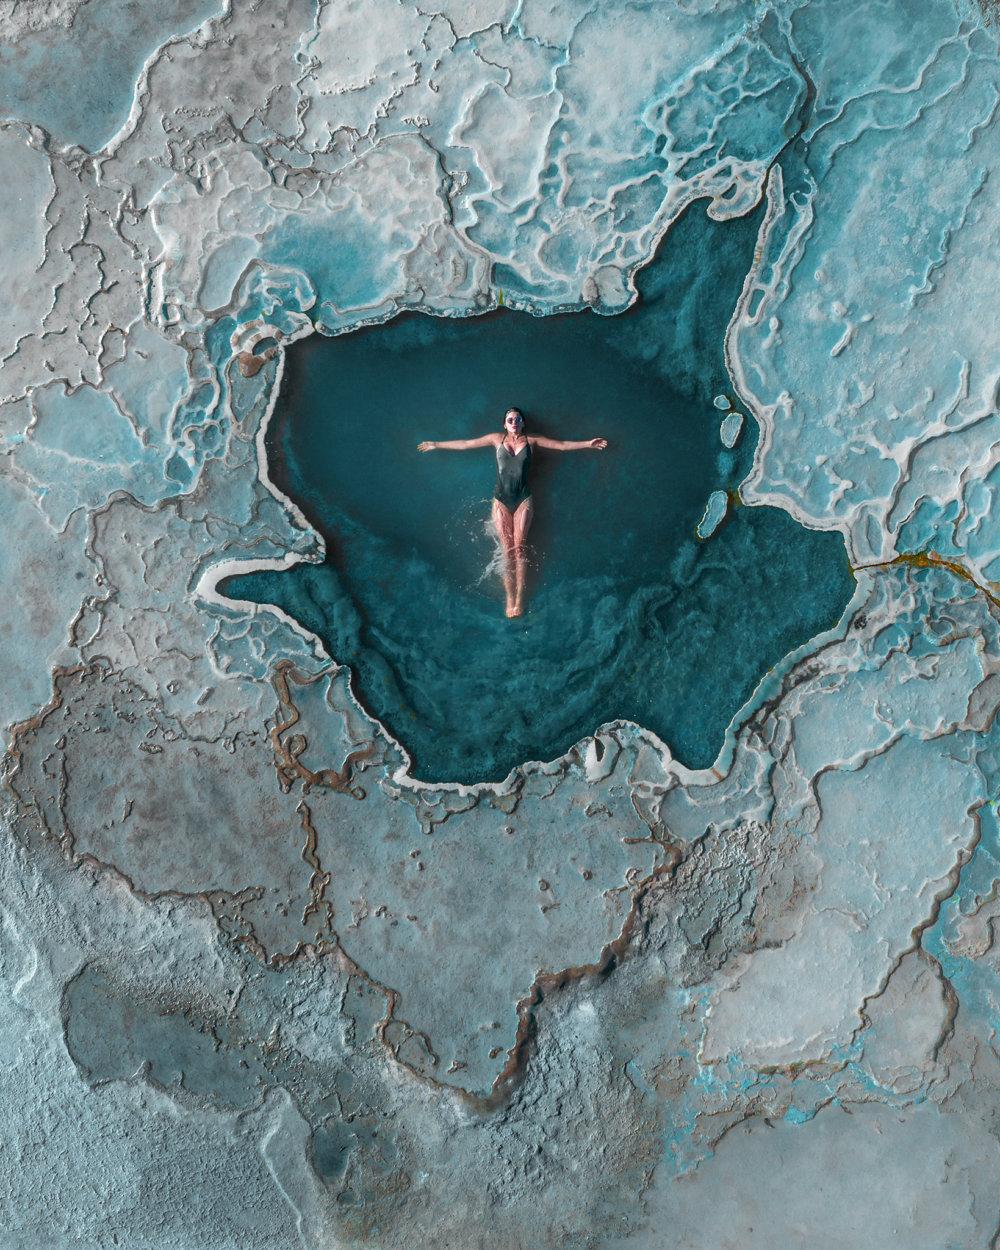 Mexico From Above Aerial Photography Series By Dimitar Karanikolov 2